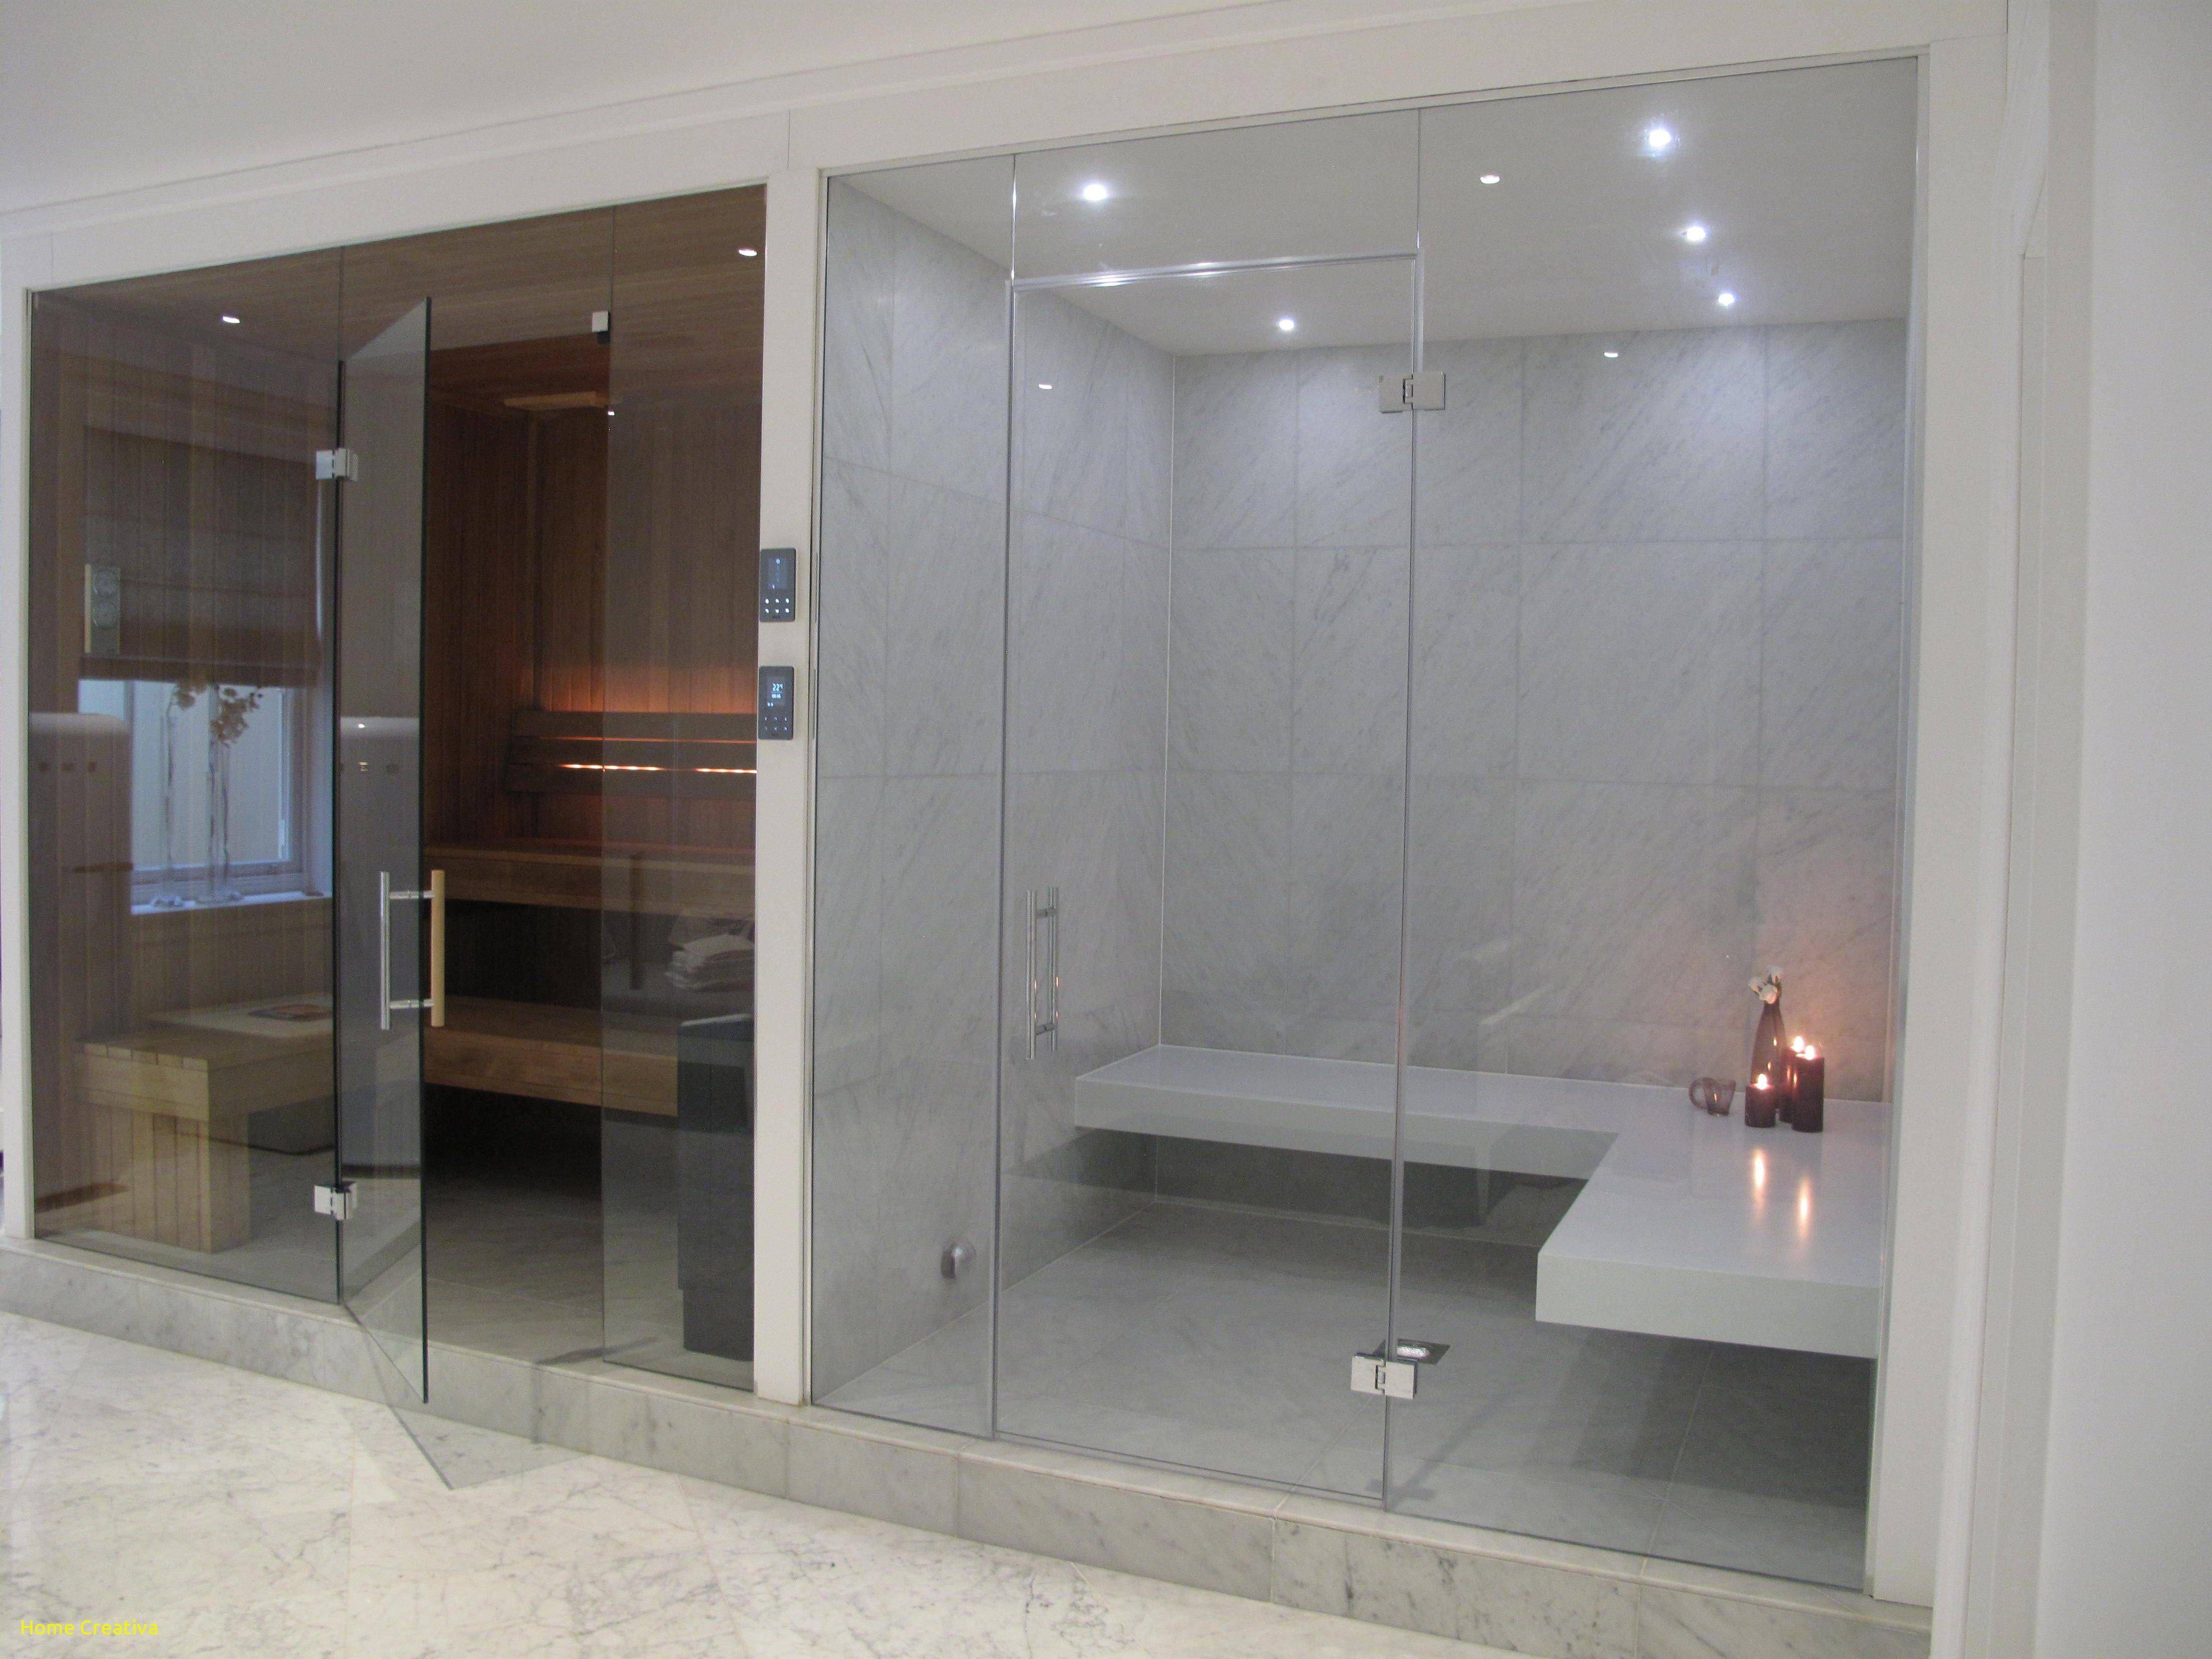 Contemporary Shower Curtains Home Steam Room Steam Room Shower